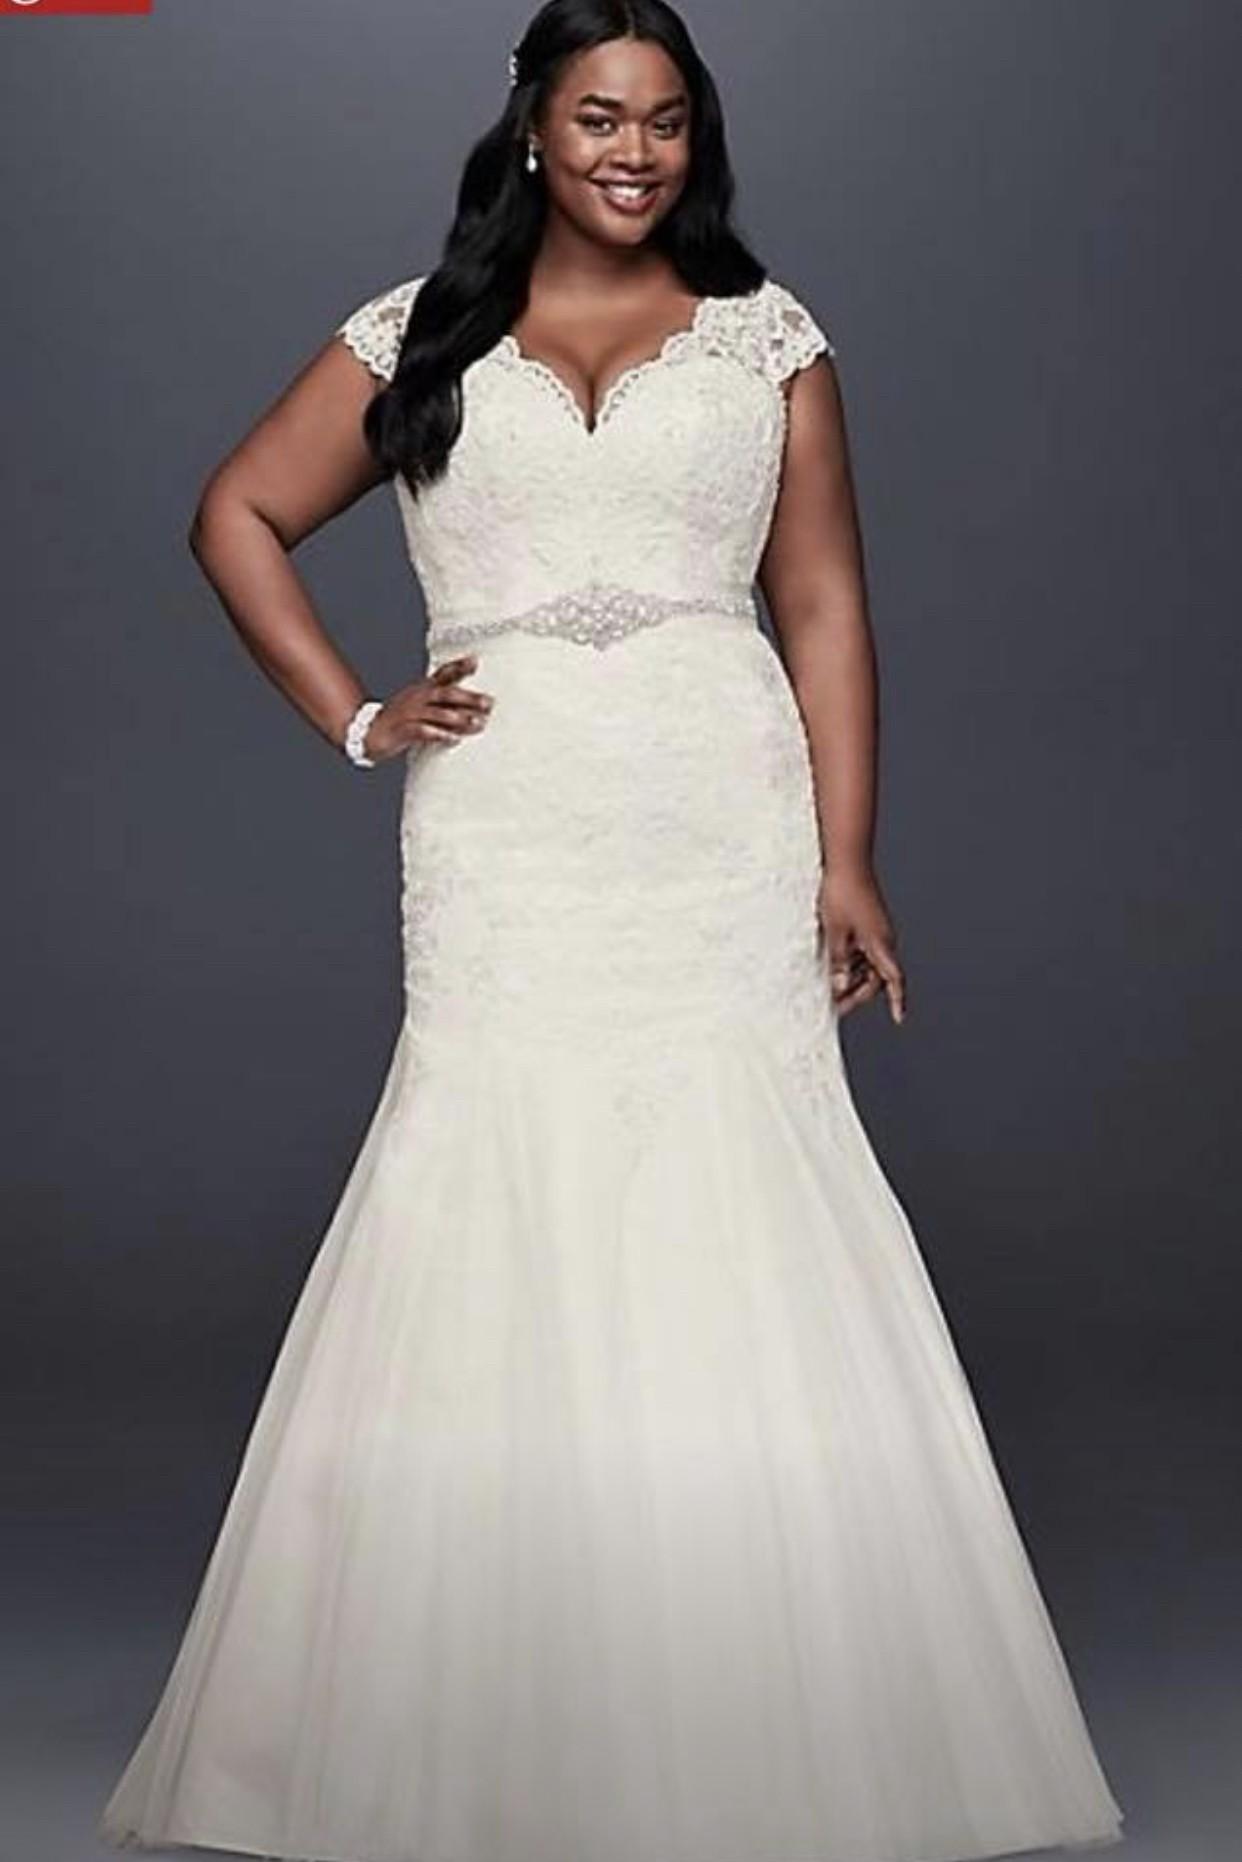 David S Bridal Collection 9wg3898 Wedding Dress On Sale 33 Off